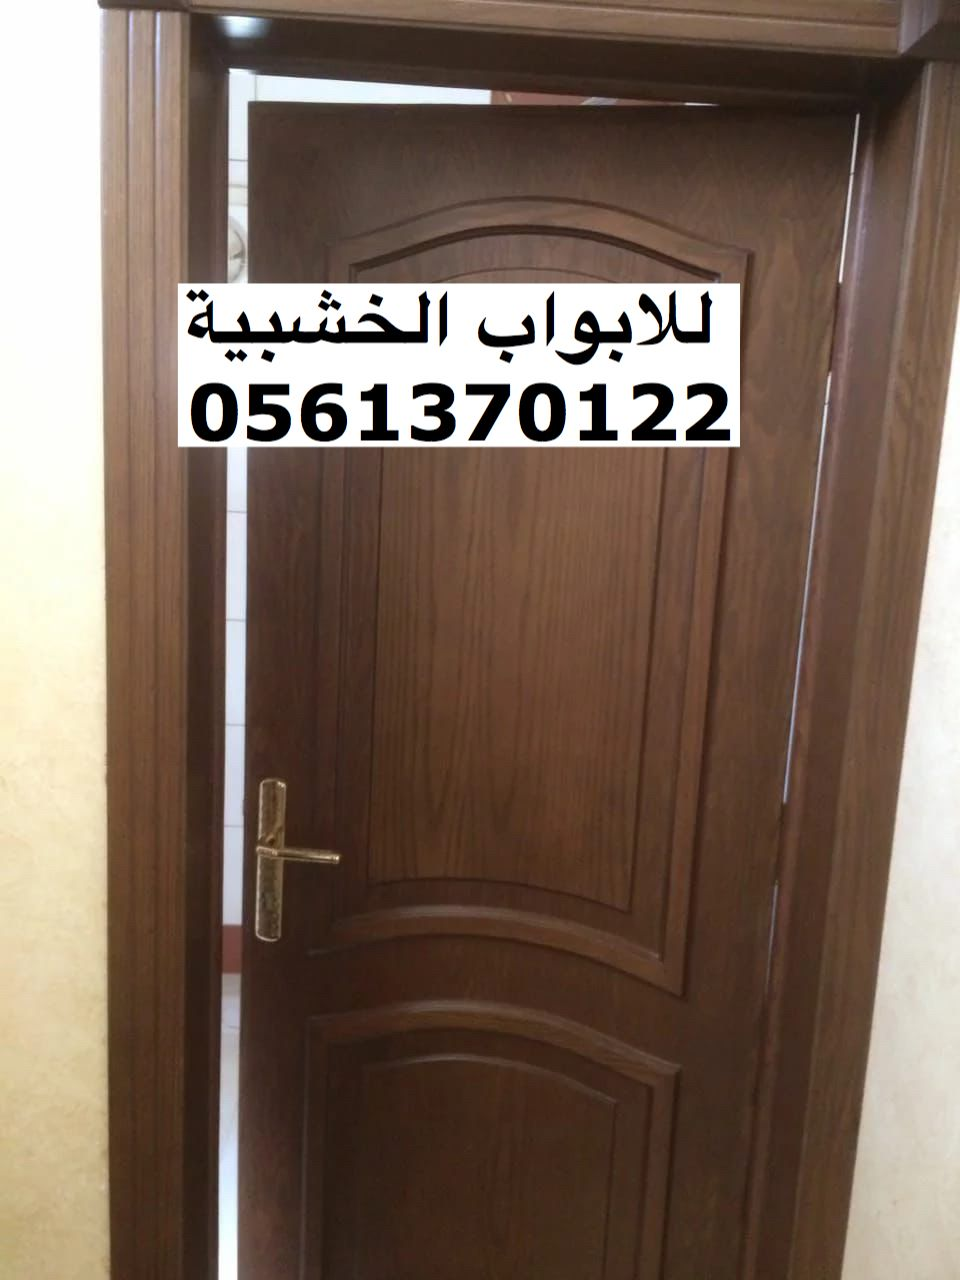 ابواب خشب باب خشب ابواب خشبية الرياض Tall Cabinet Storage Luxury Bedroom Master Luxurious Bedrooms